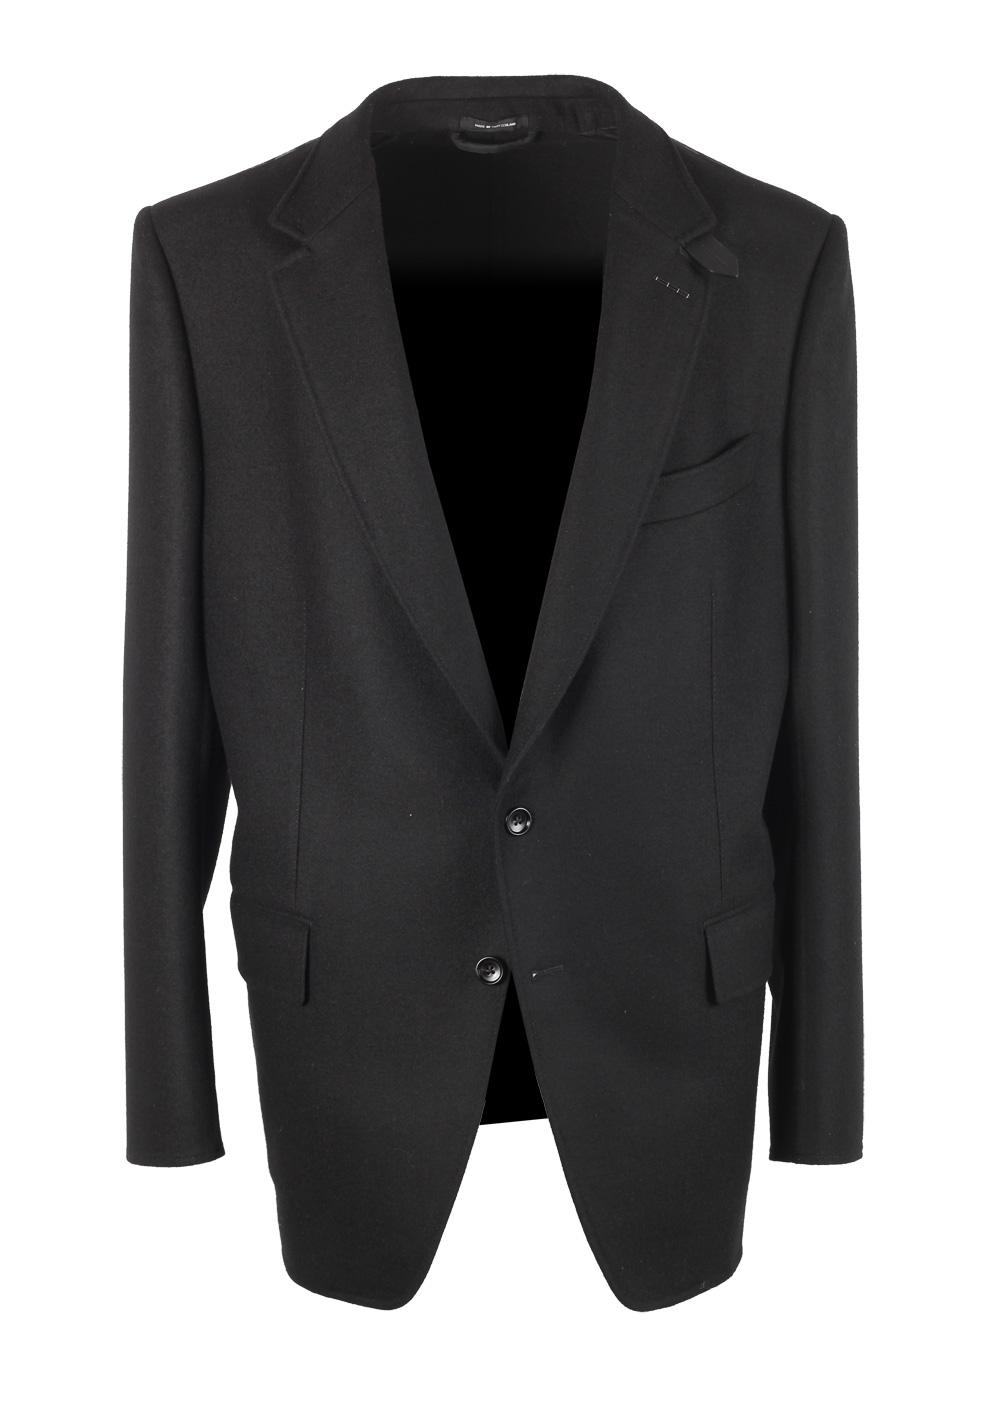 TOM FORD Atticus Black Sport Coat Size 56 / 46R U.S. In Wool | Costume Limité